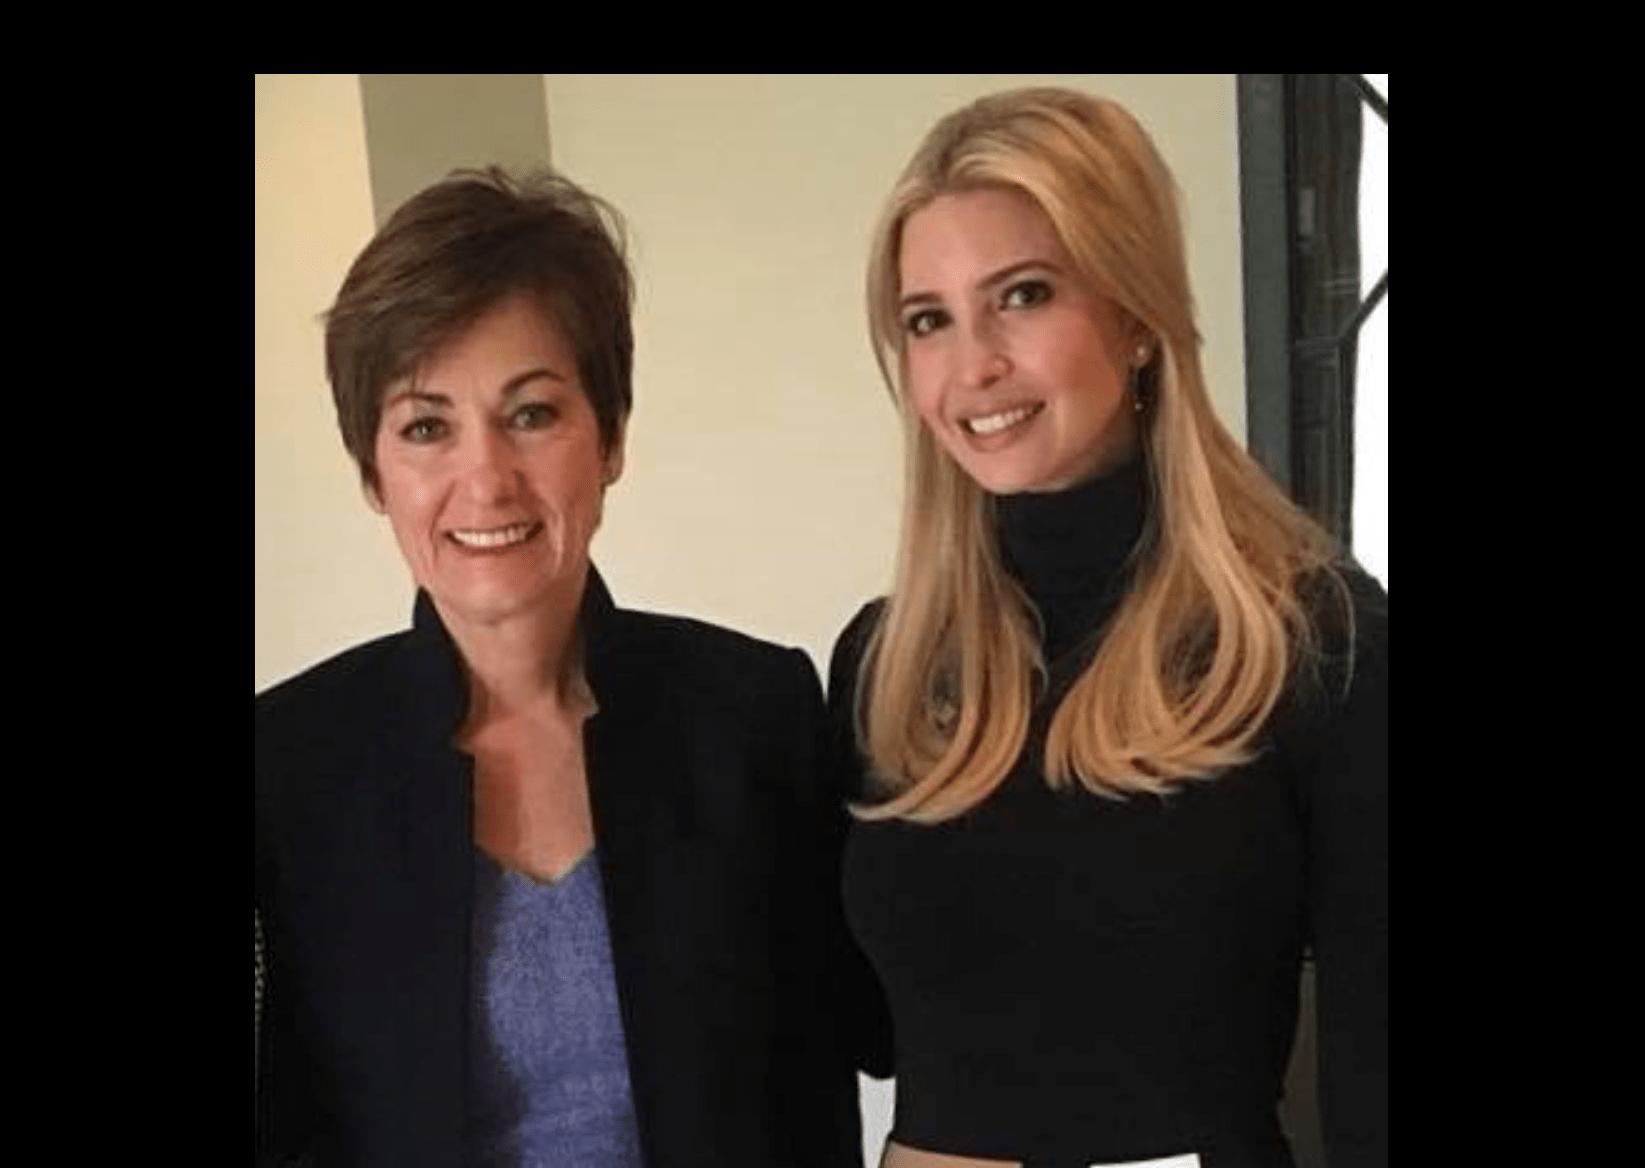 Iowa Hair Salon Receives BACKLASH For Doing Ivanka Trump's Hair